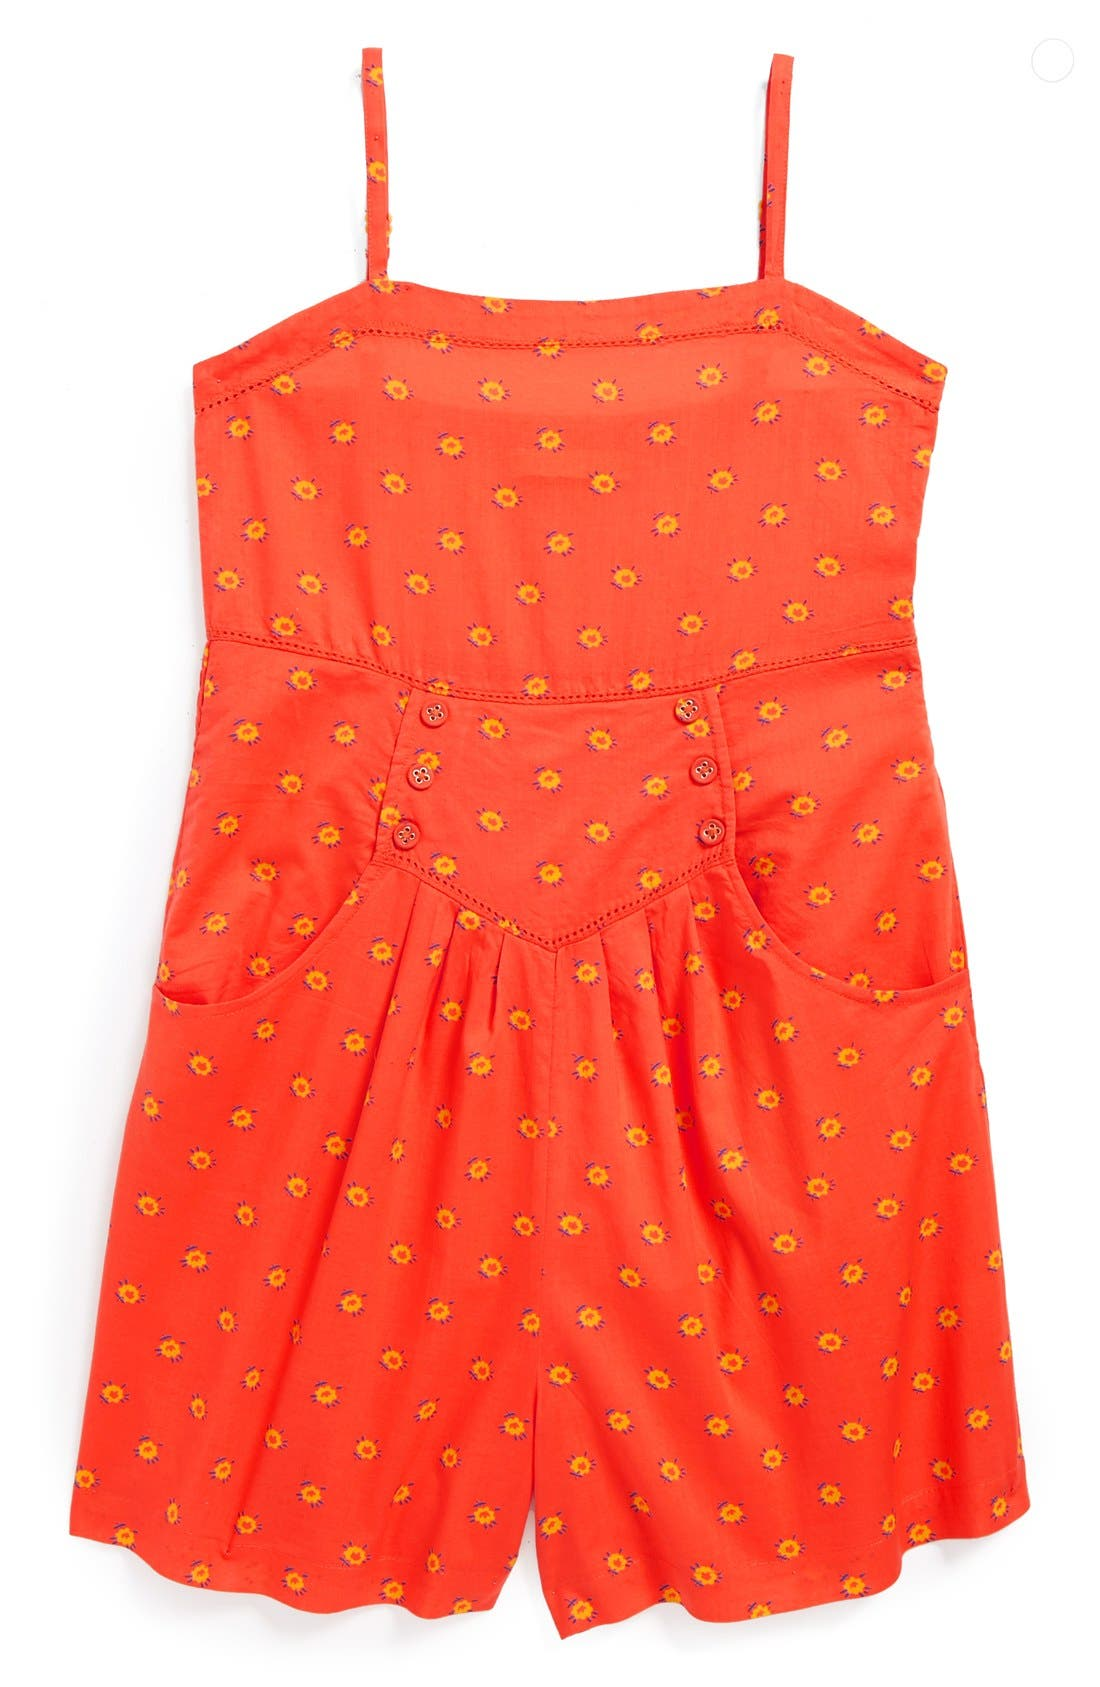 Main Image - Stella McCartney Floral Print Cotton Romper (Toddler Girls, Little Girls & Big Girls)